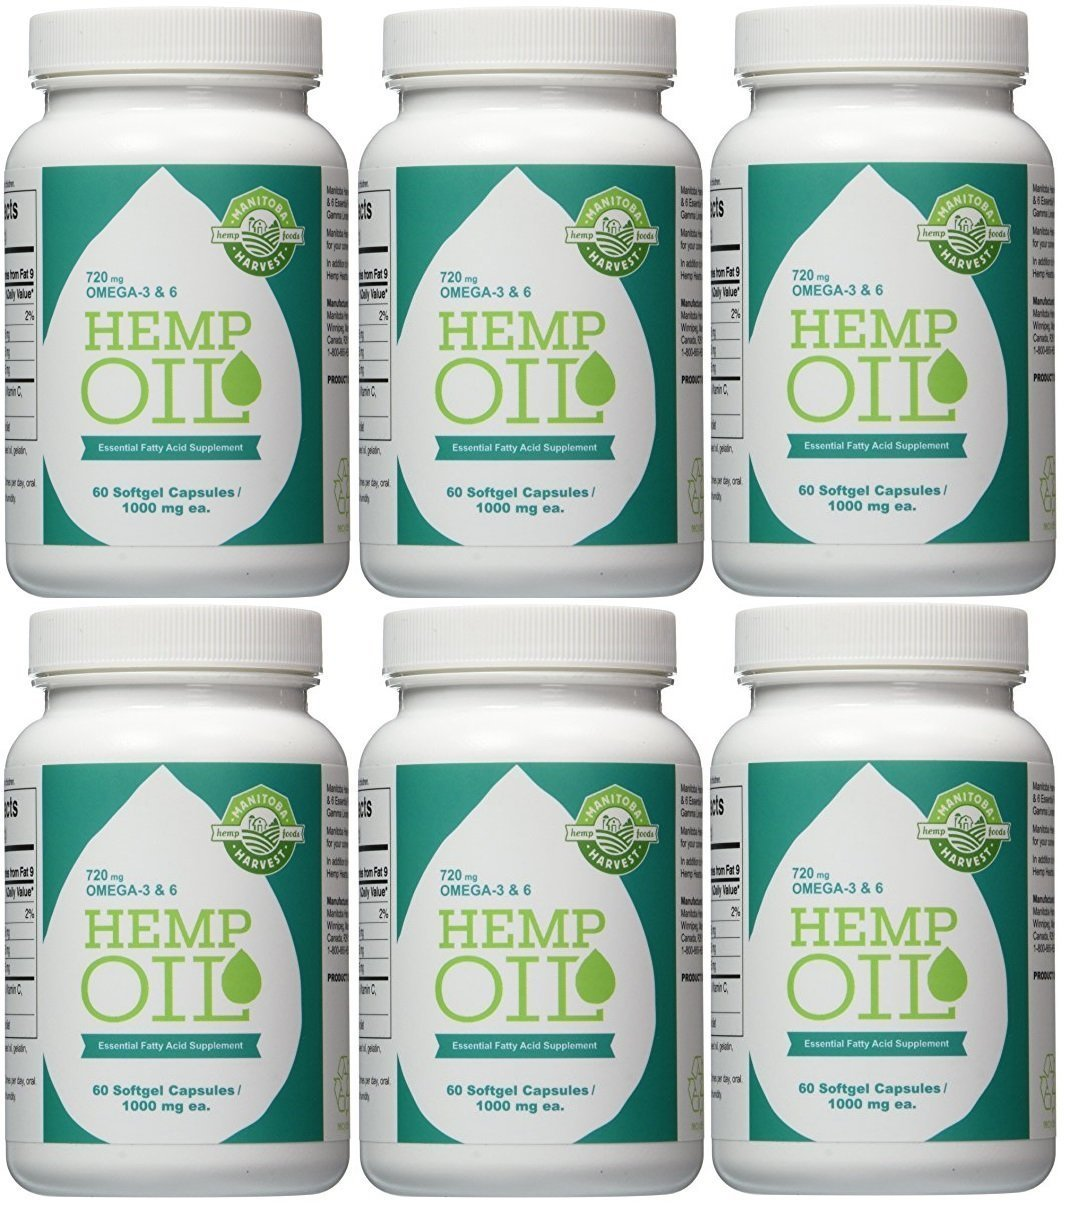 Manitoba Harvest Hemp Oil, 1000Mg, 60 Softgels(Pack of 6)